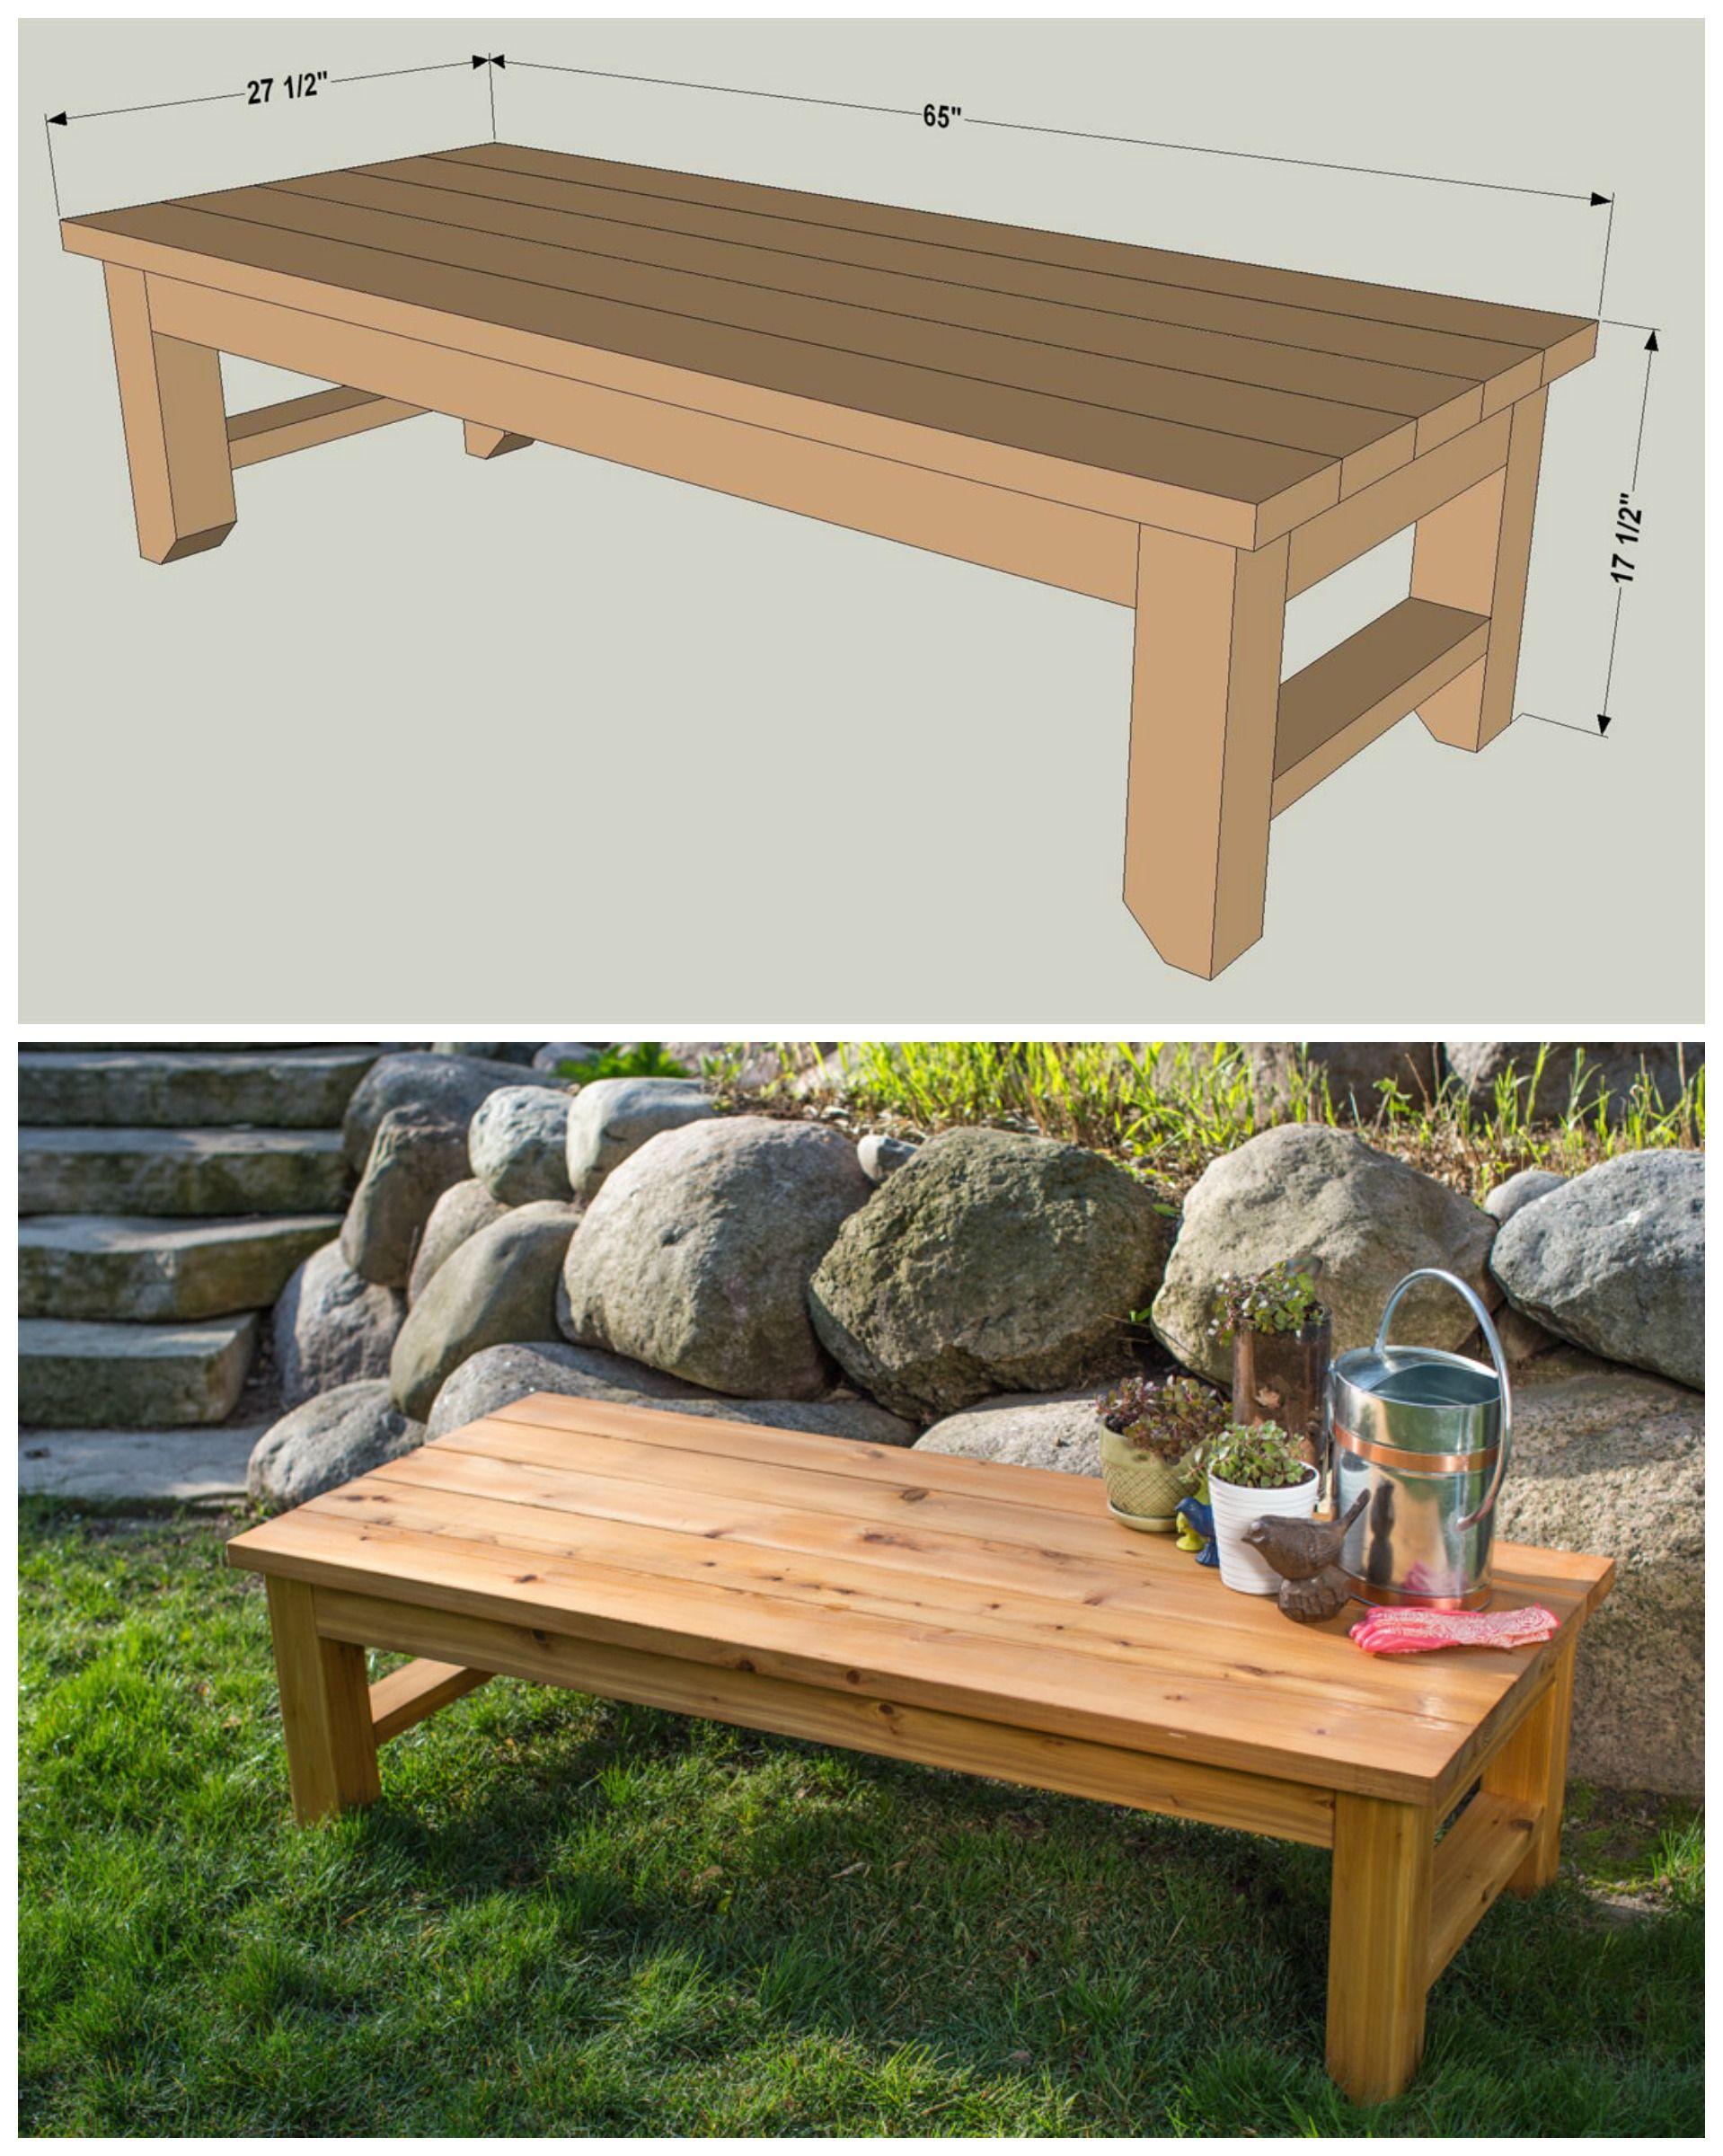 Diy Cedar Bench Free Plans At Buildsomething Com Diy Bench